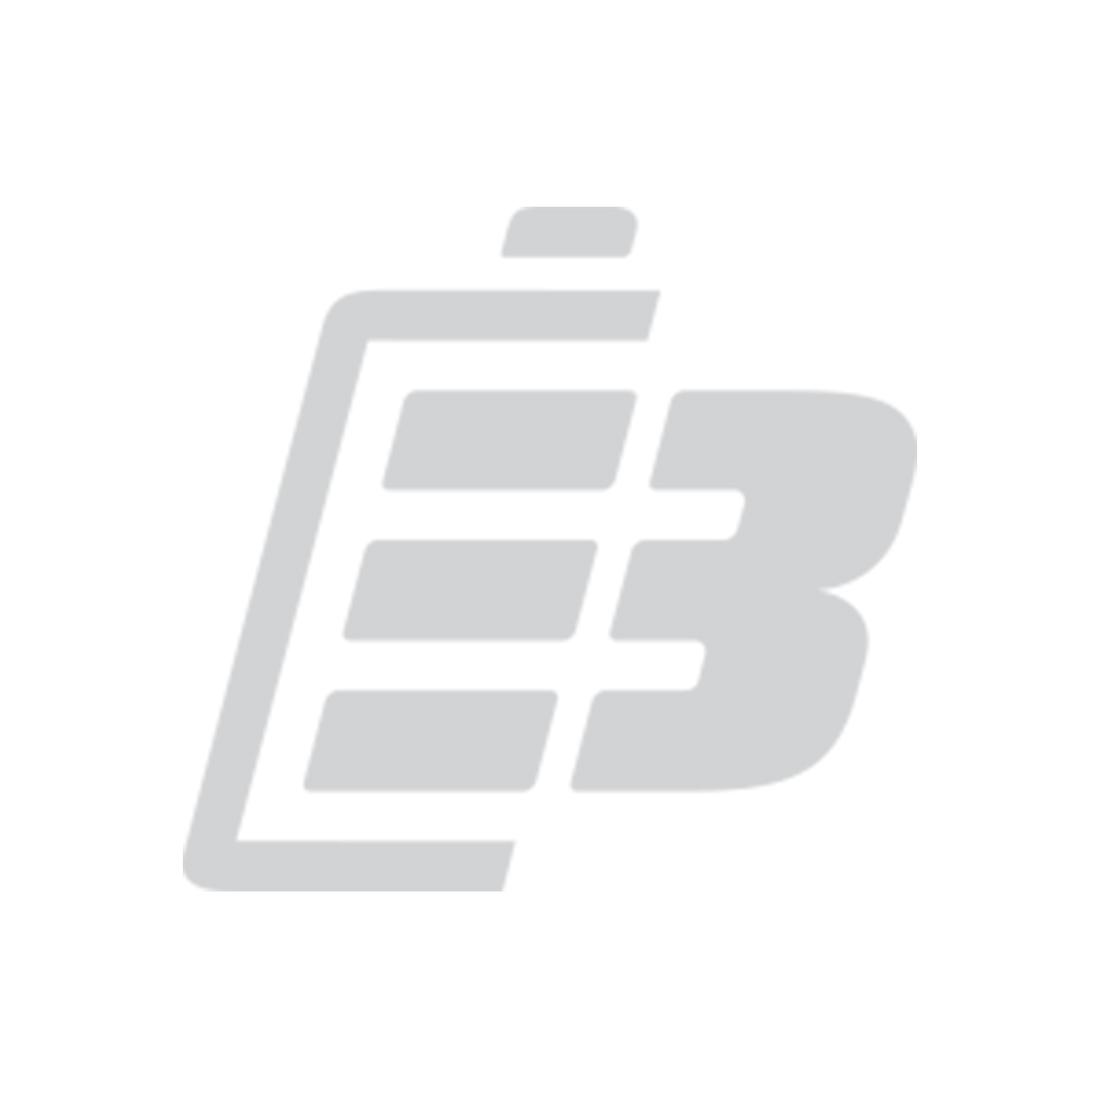 Laptop battery Compaq Presario 2100_1